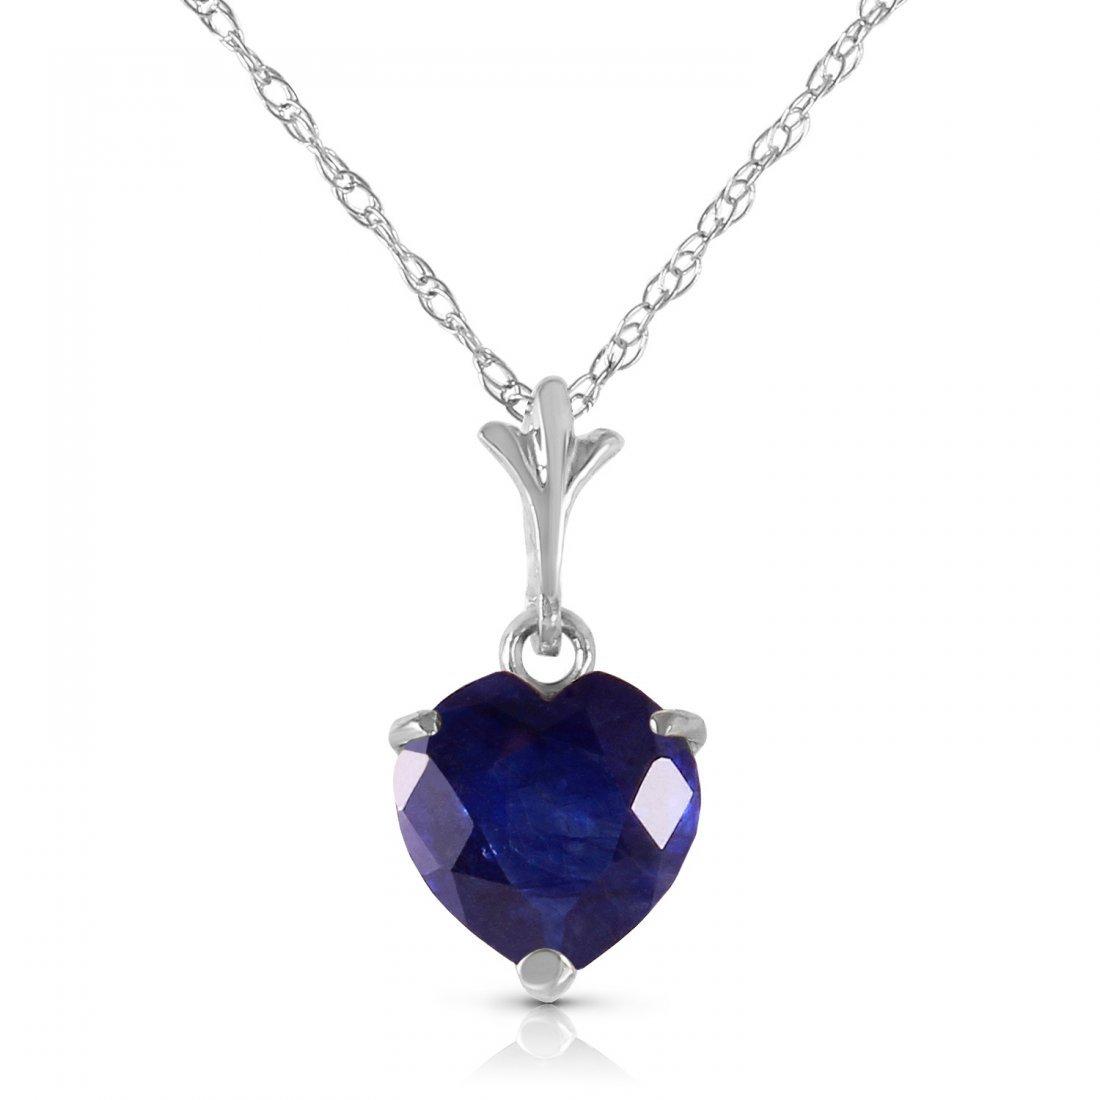 Genuine 1.55 ctw Sapphire Necklace Jewelry 14KT White